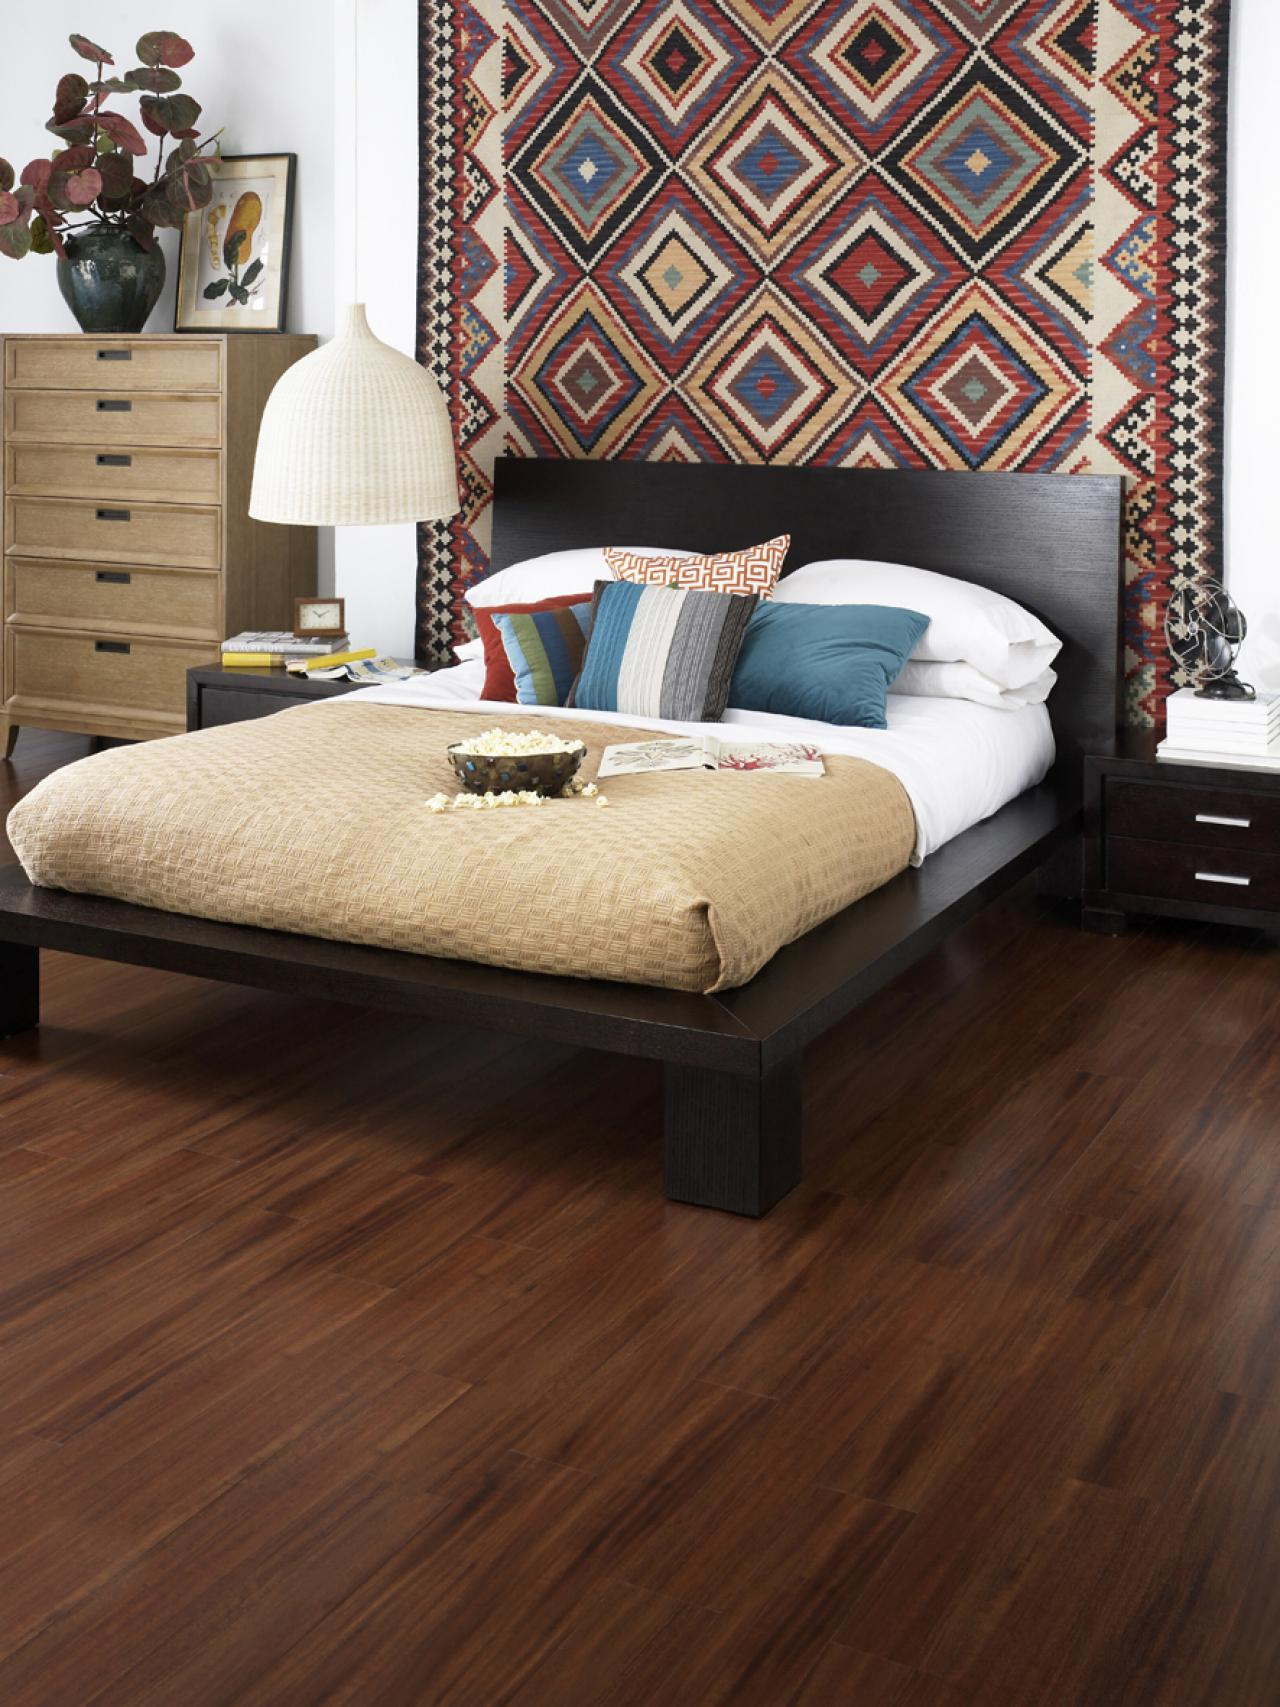 Decorative Bedroom Hacks For Minimizing Dust